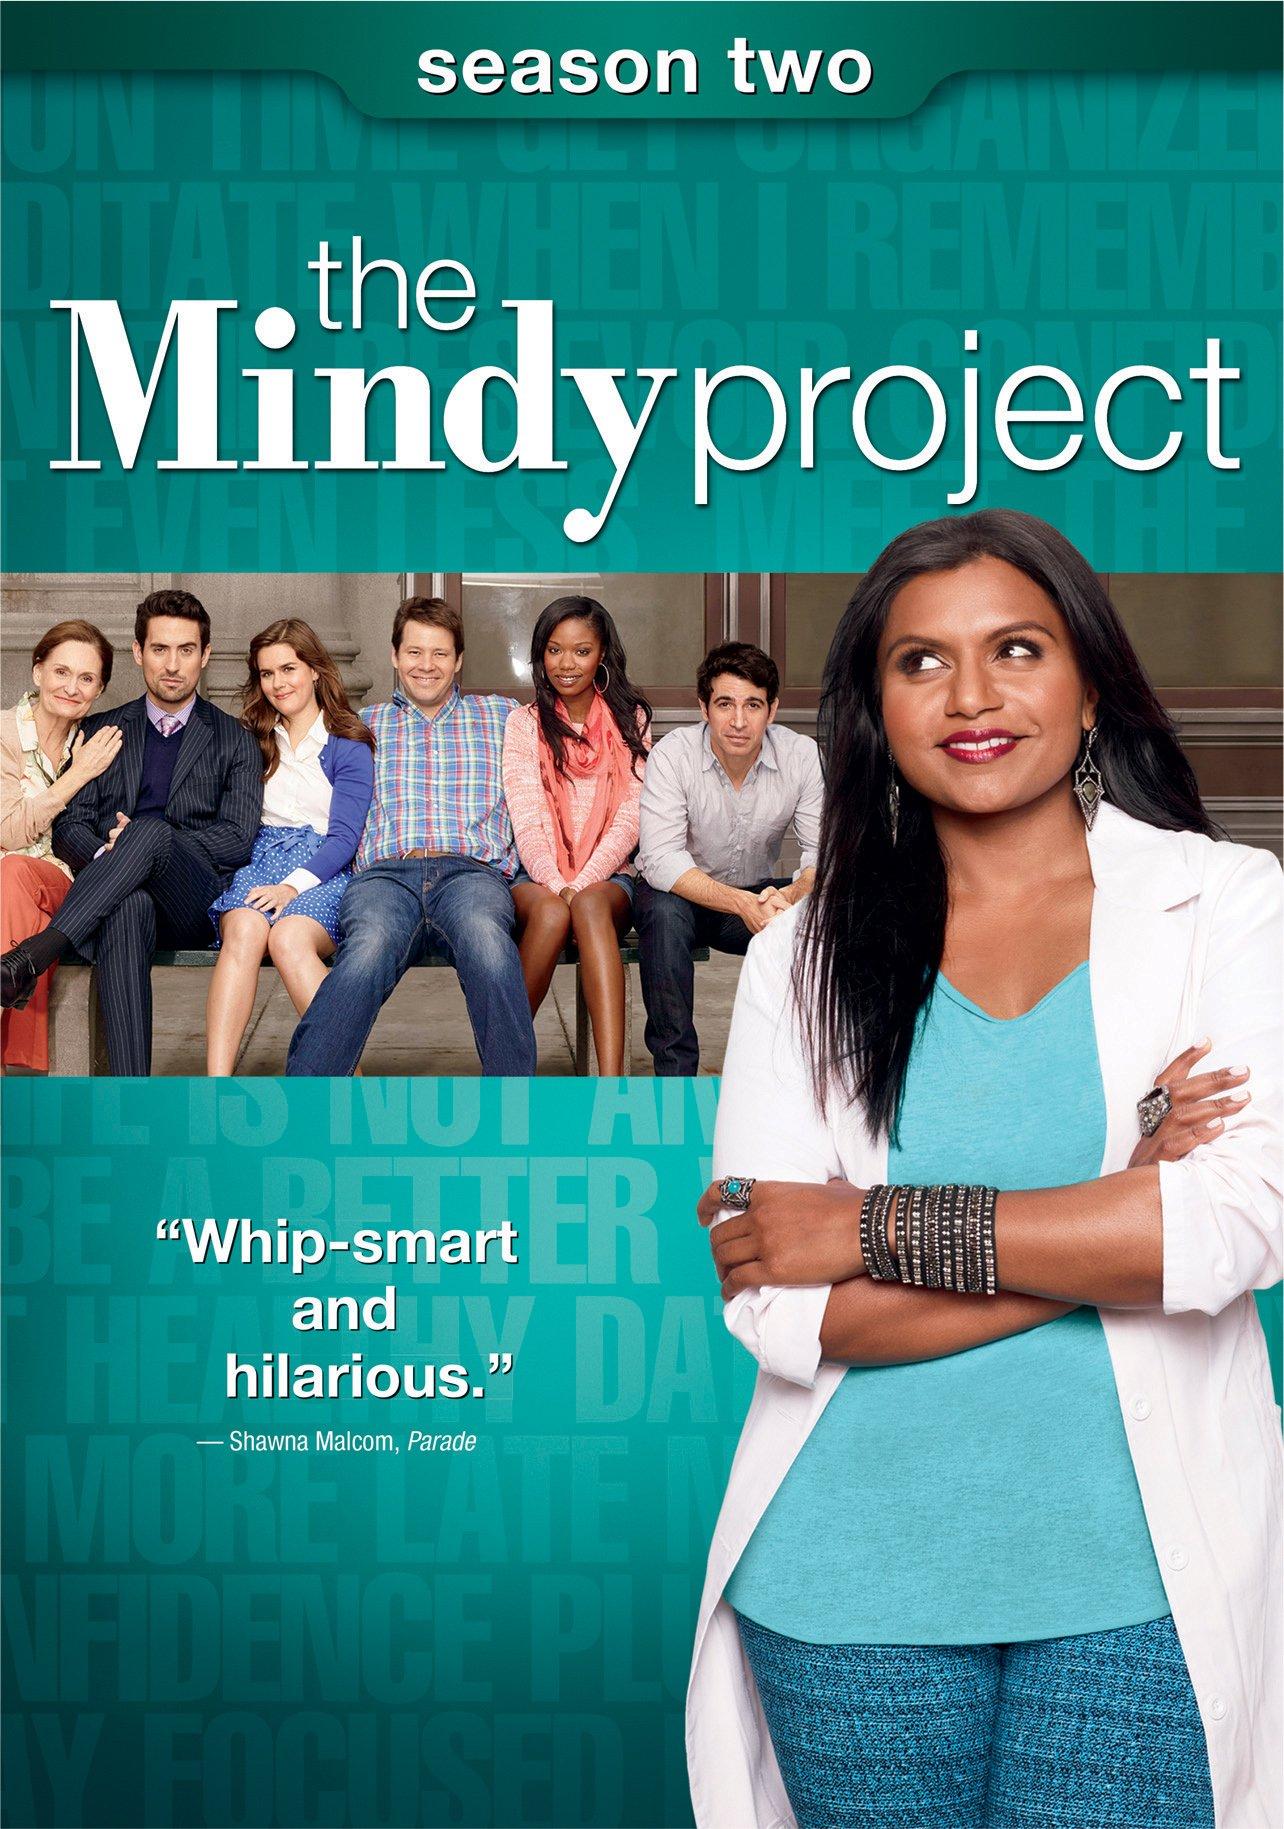 THE MINDY PROJECT SEASON 2 DVD